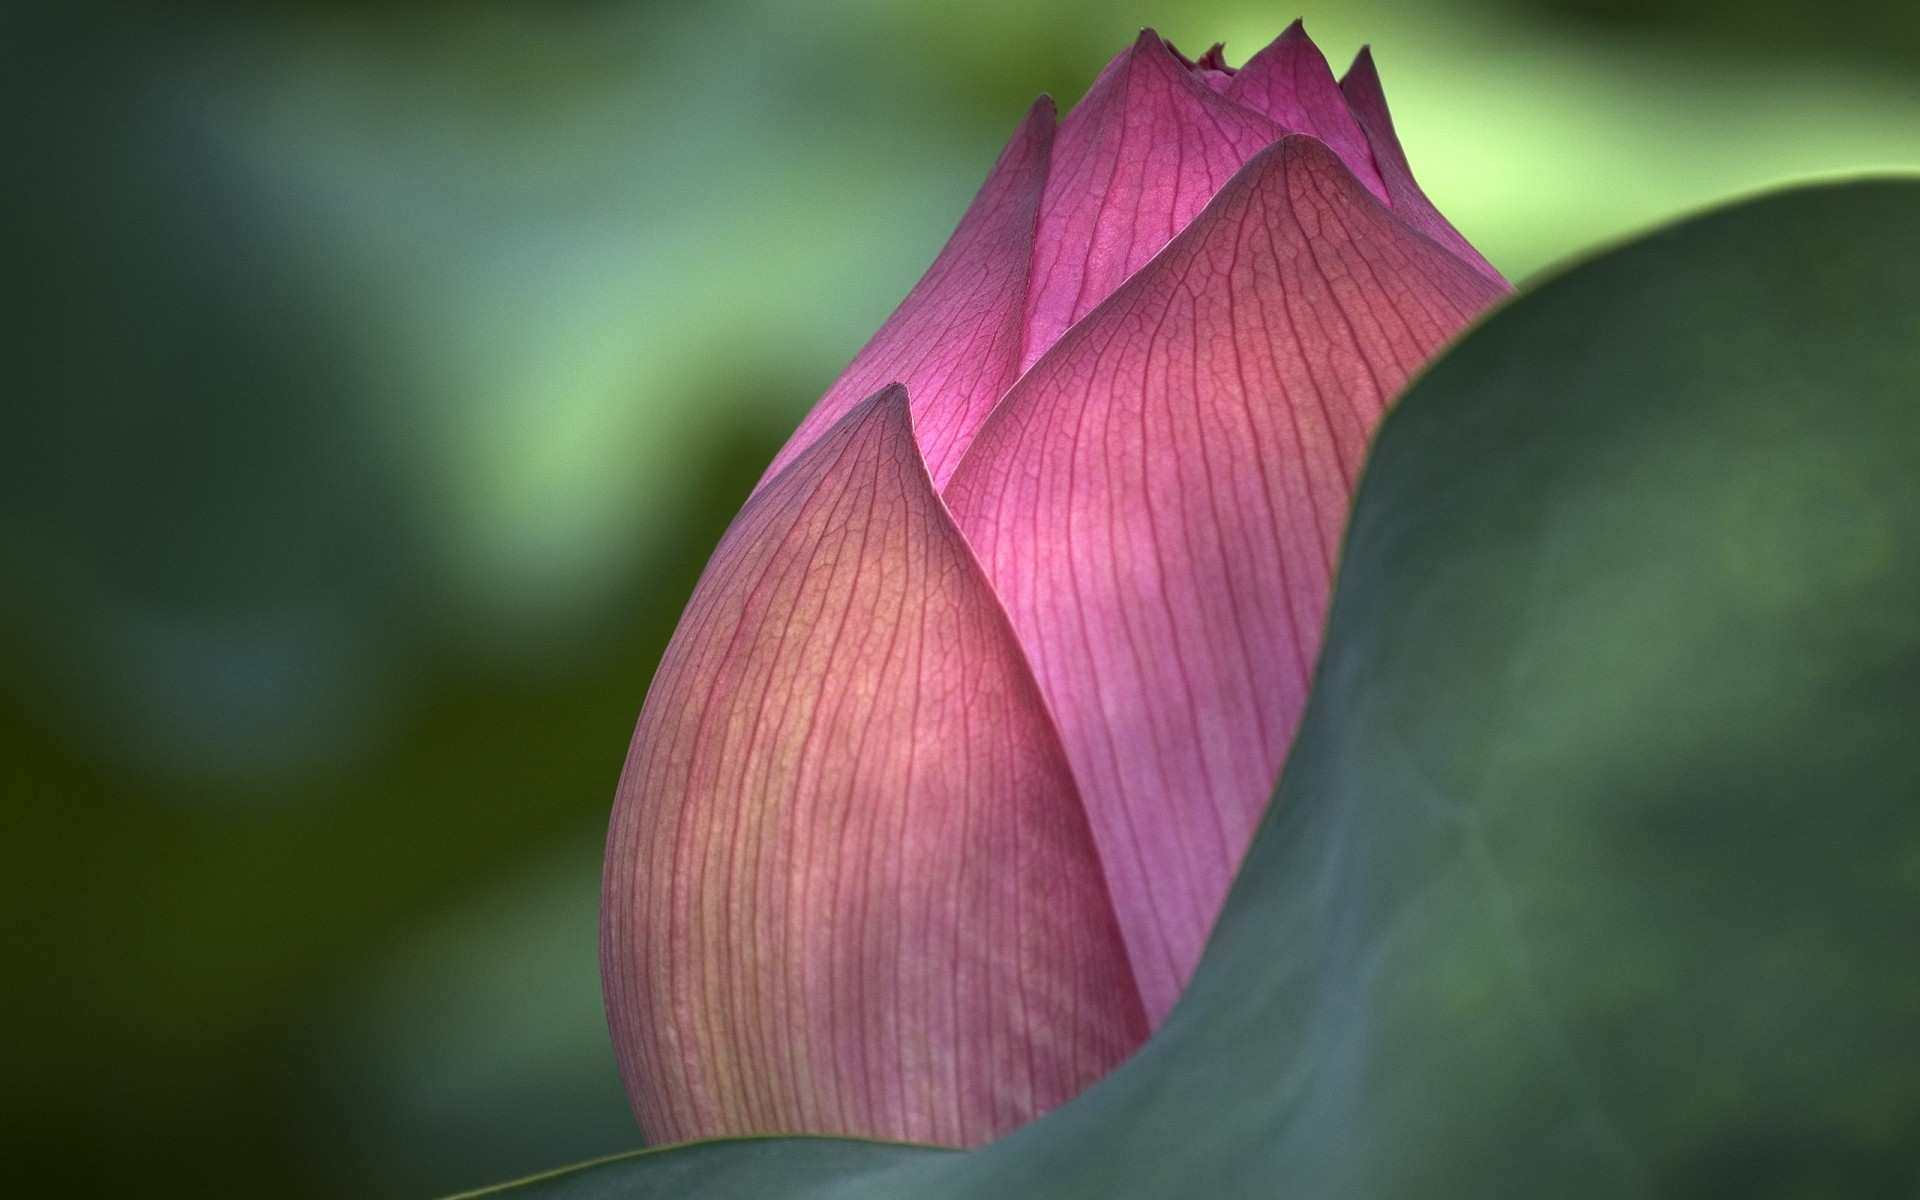 Lotus Flower Desktop Wallpapers For Free